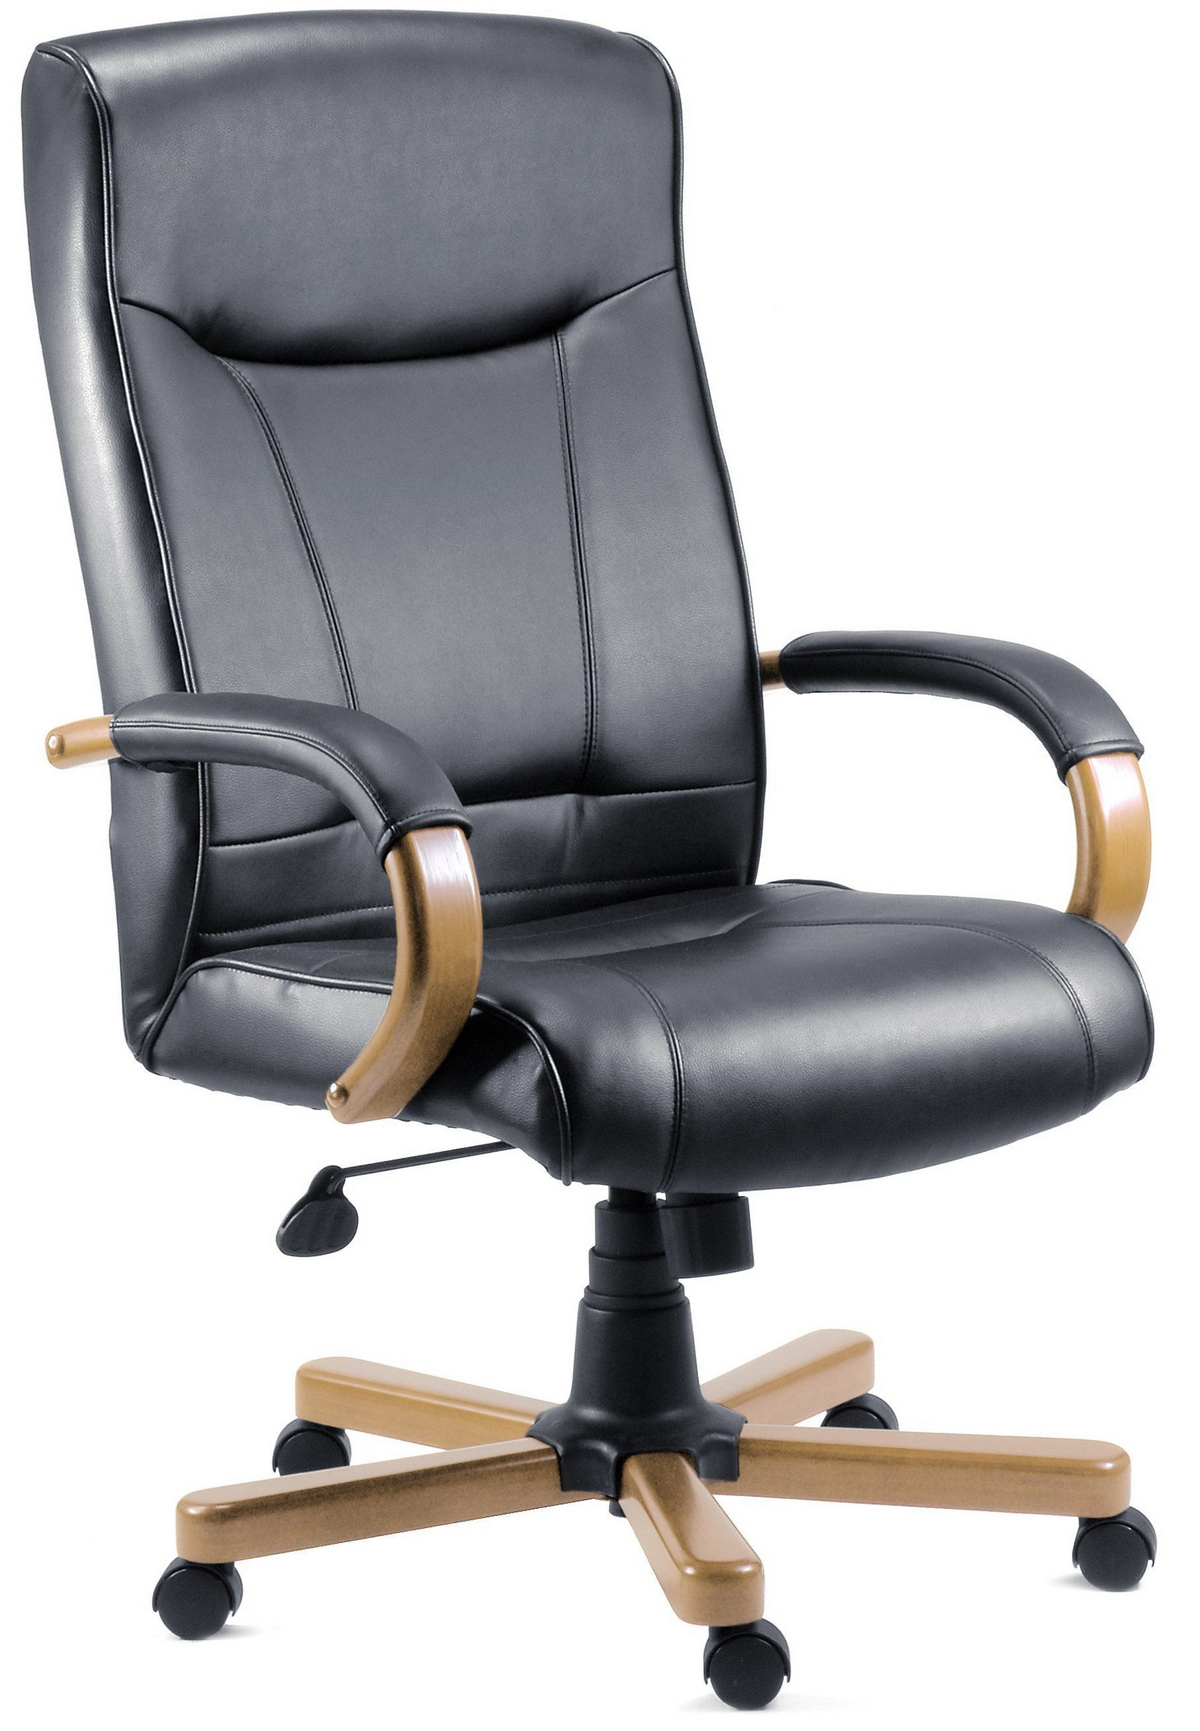 kingston light wood executive chair. Black Bedroom Furniture Sets. Home Design Ideas